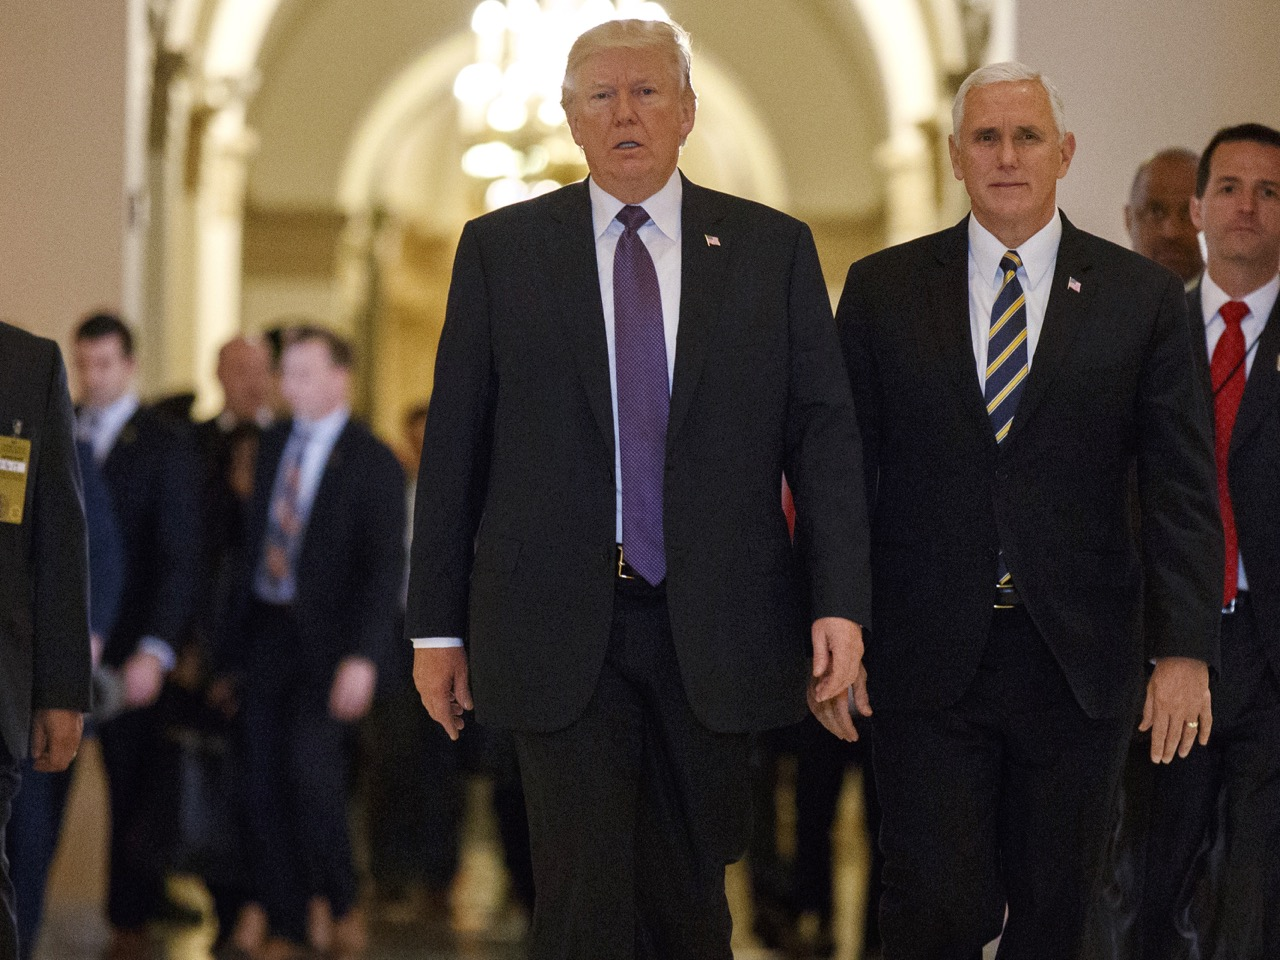 Republikaner oense om krigsfangarna